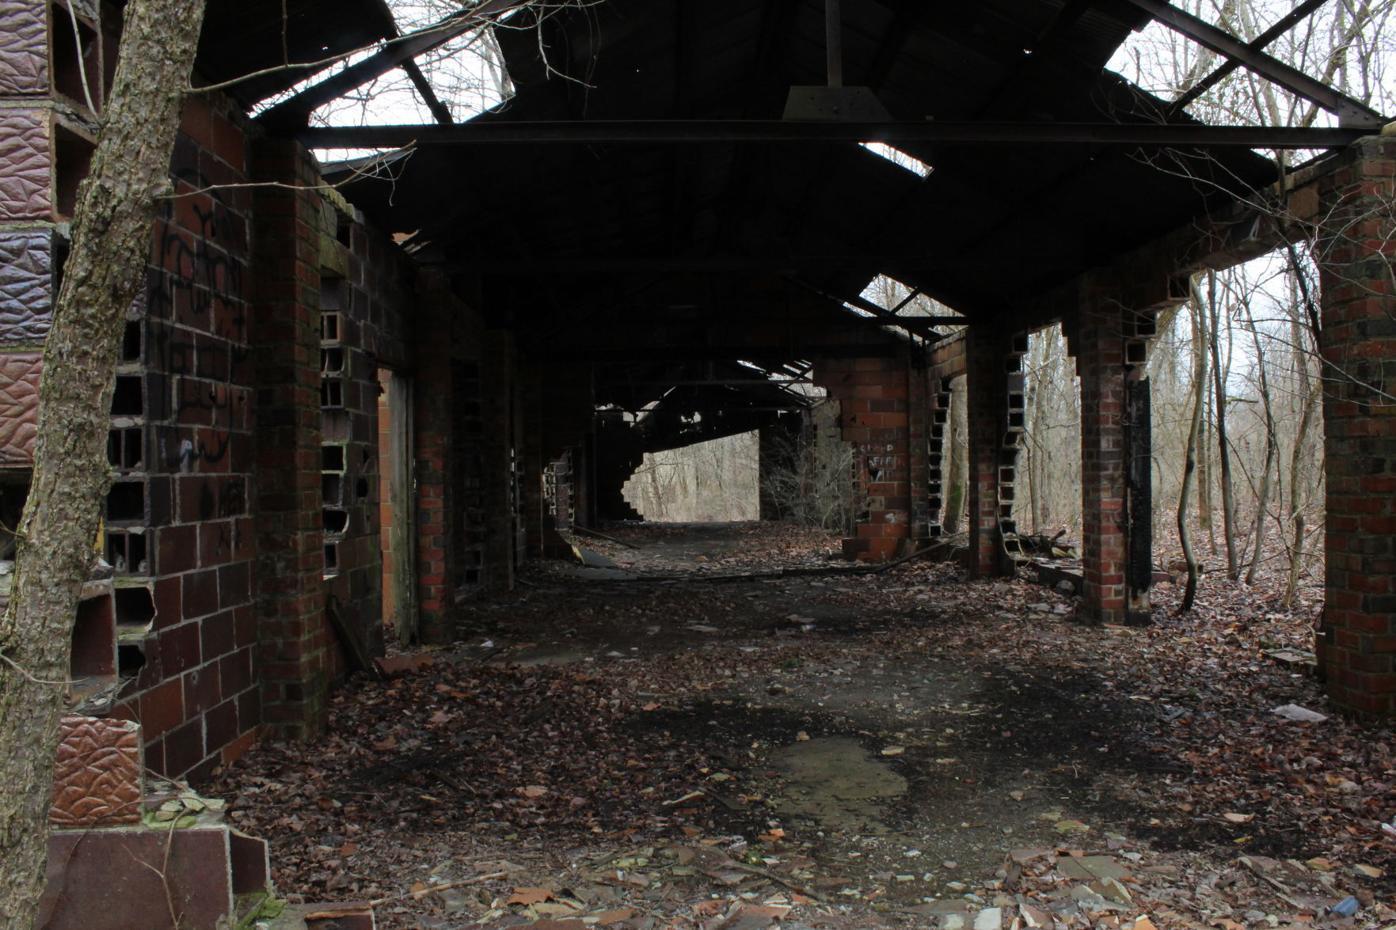 Mine buildings in The Baileys